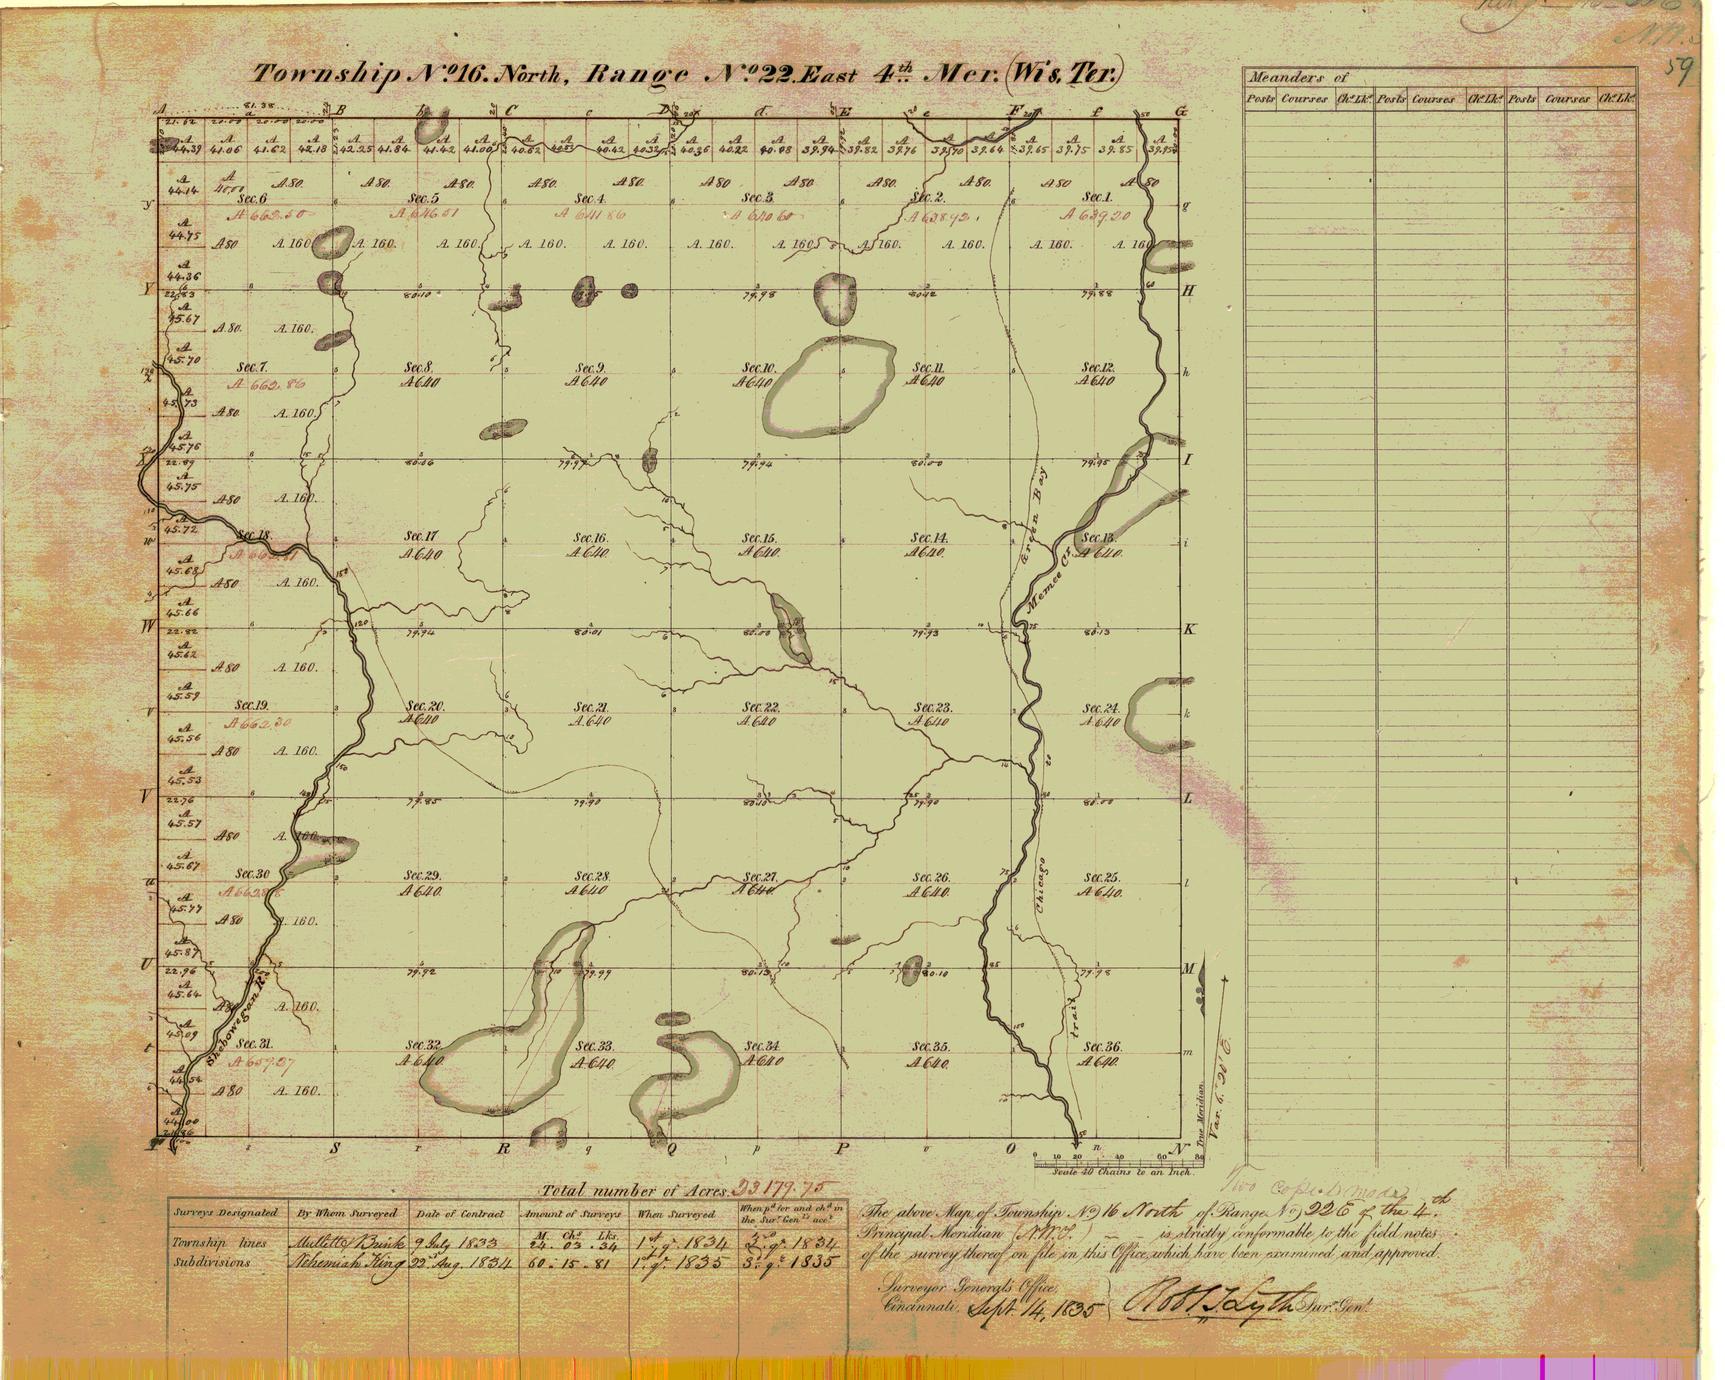 [Public Land Survey System map: Wisconsin Township 16 North, Range 22 East]